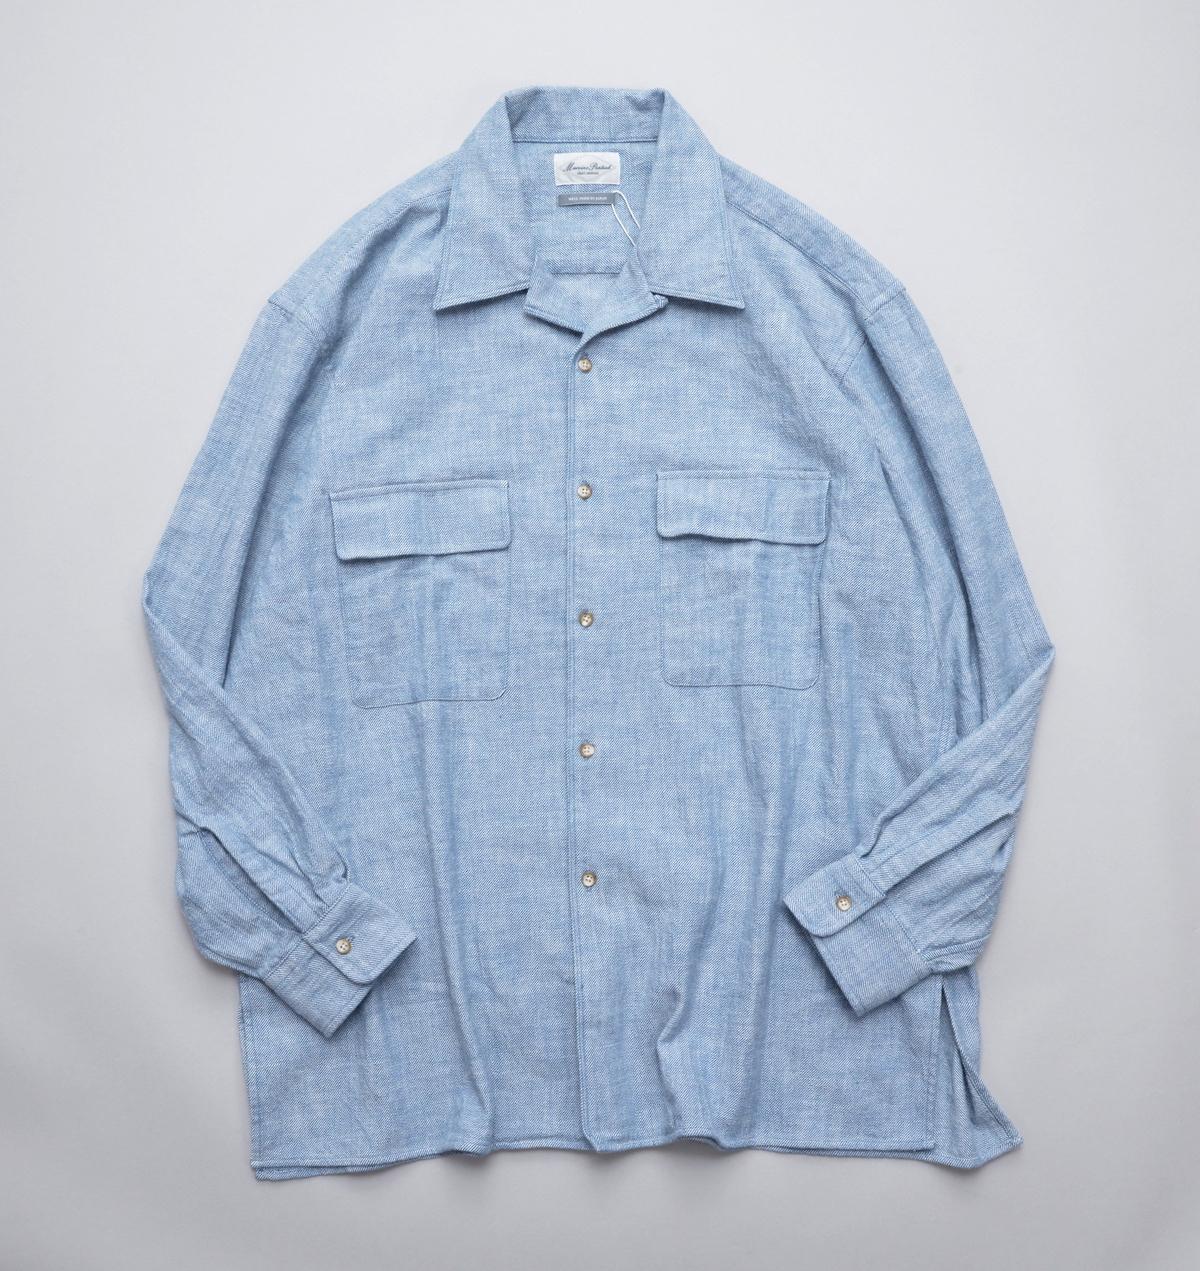 Marvine Pontiak shirt makers 「 Open Collar SH / Blue Kersey 」